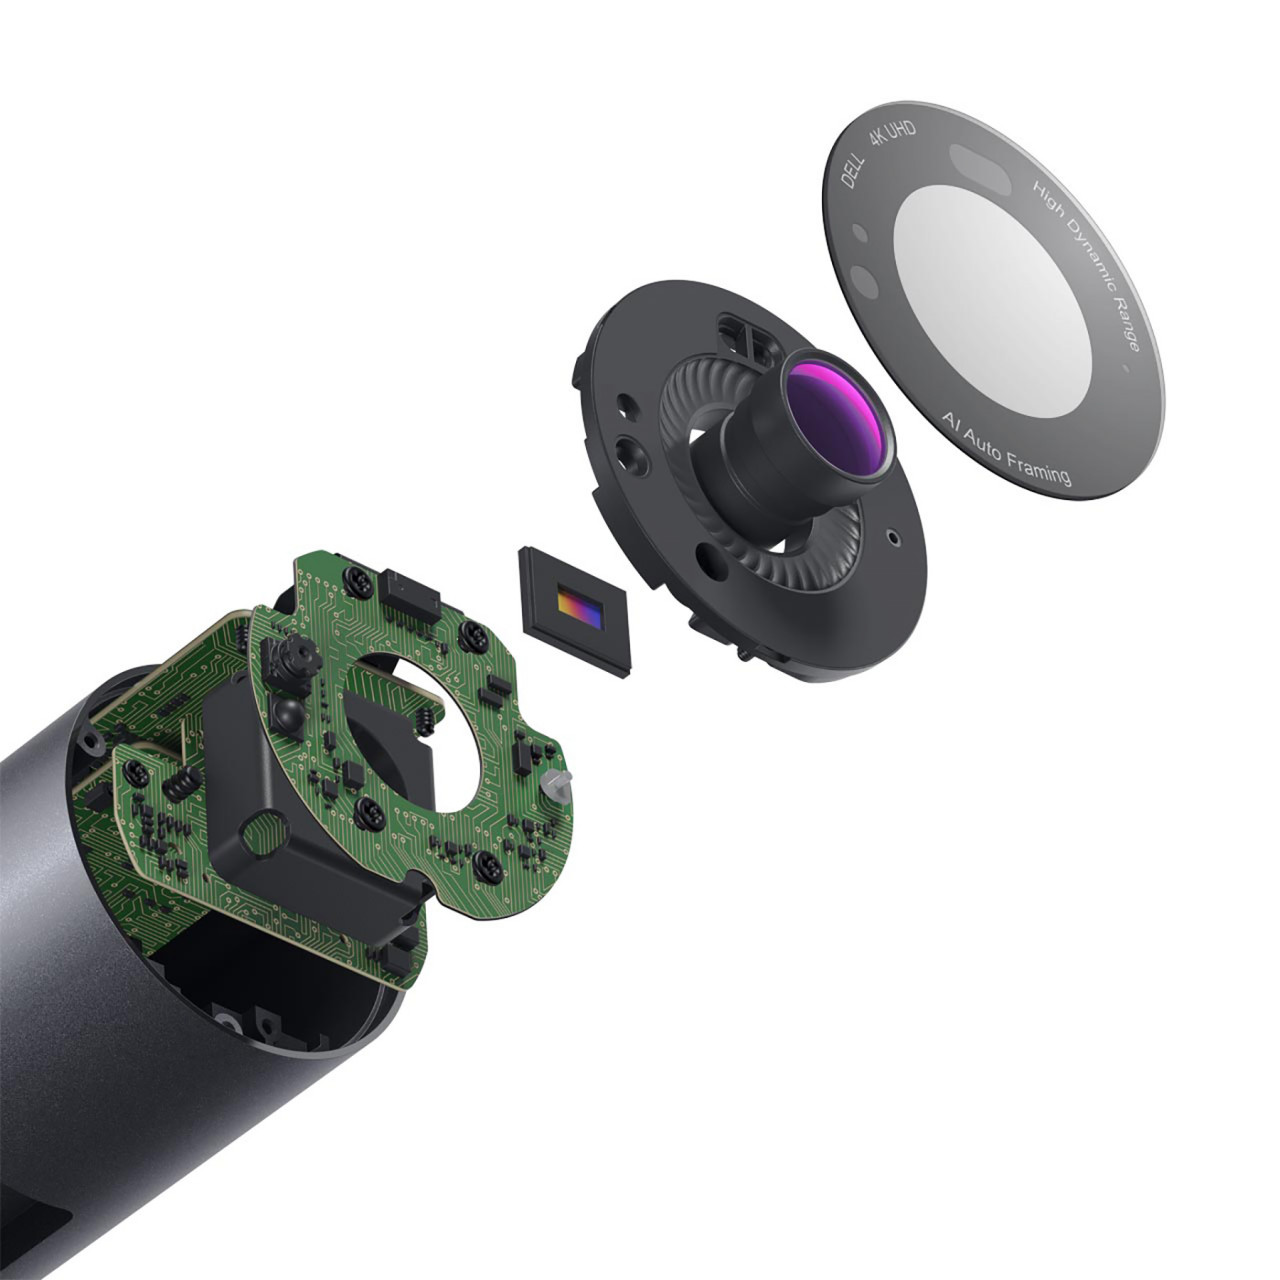 Dell UltraSharp Webcam Is Sharply Designed with an Even Sharper 4K Picture